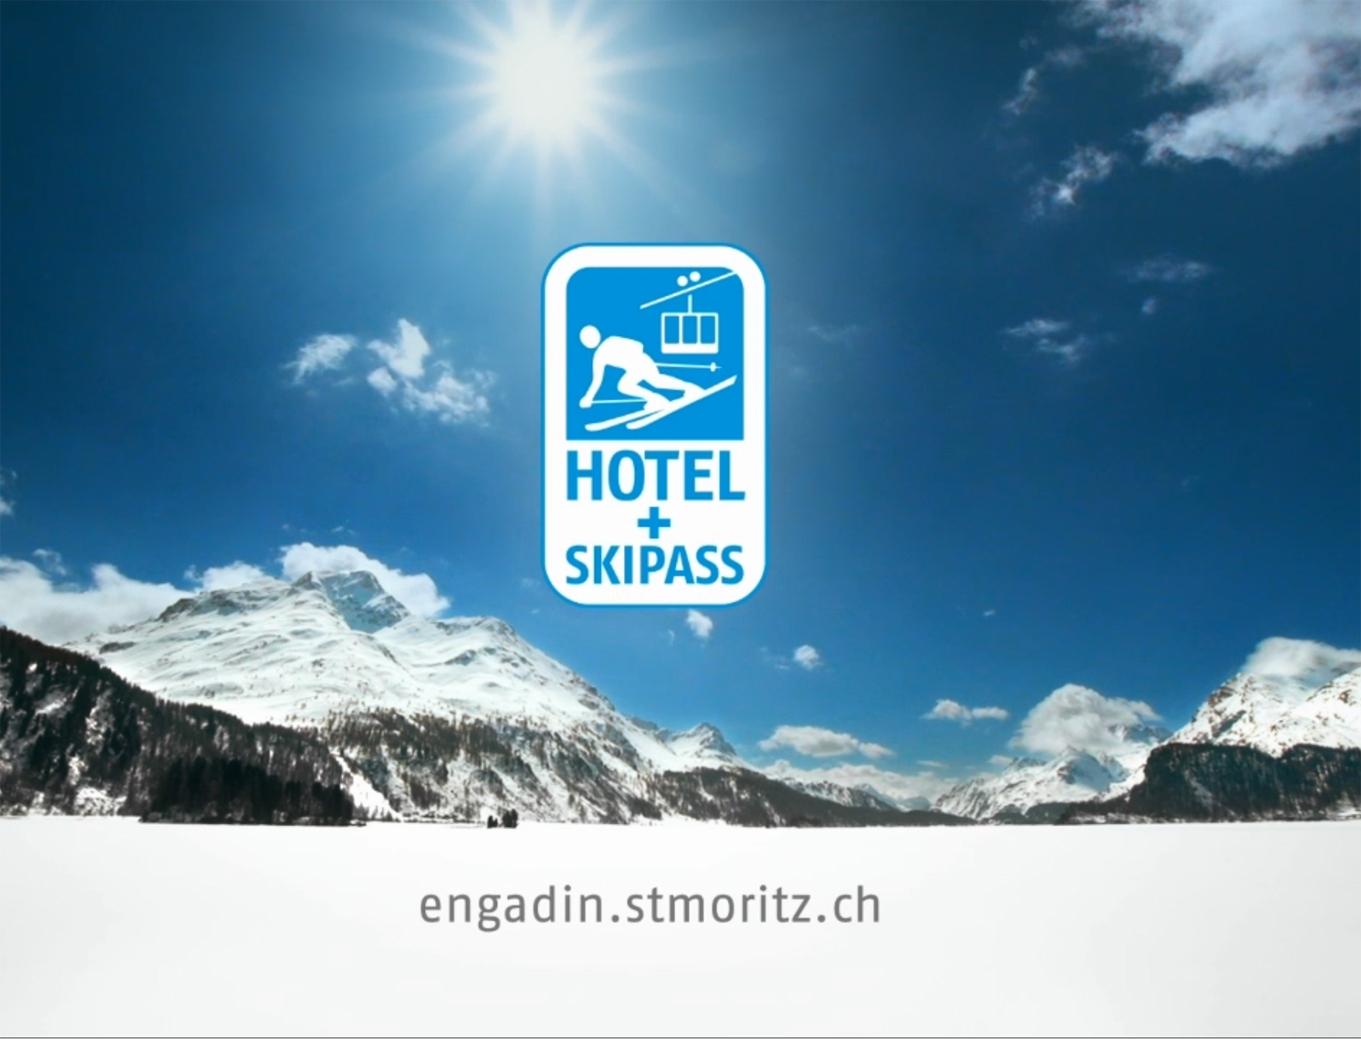 TV-Spot «Hotel und Skipass» Slide 1